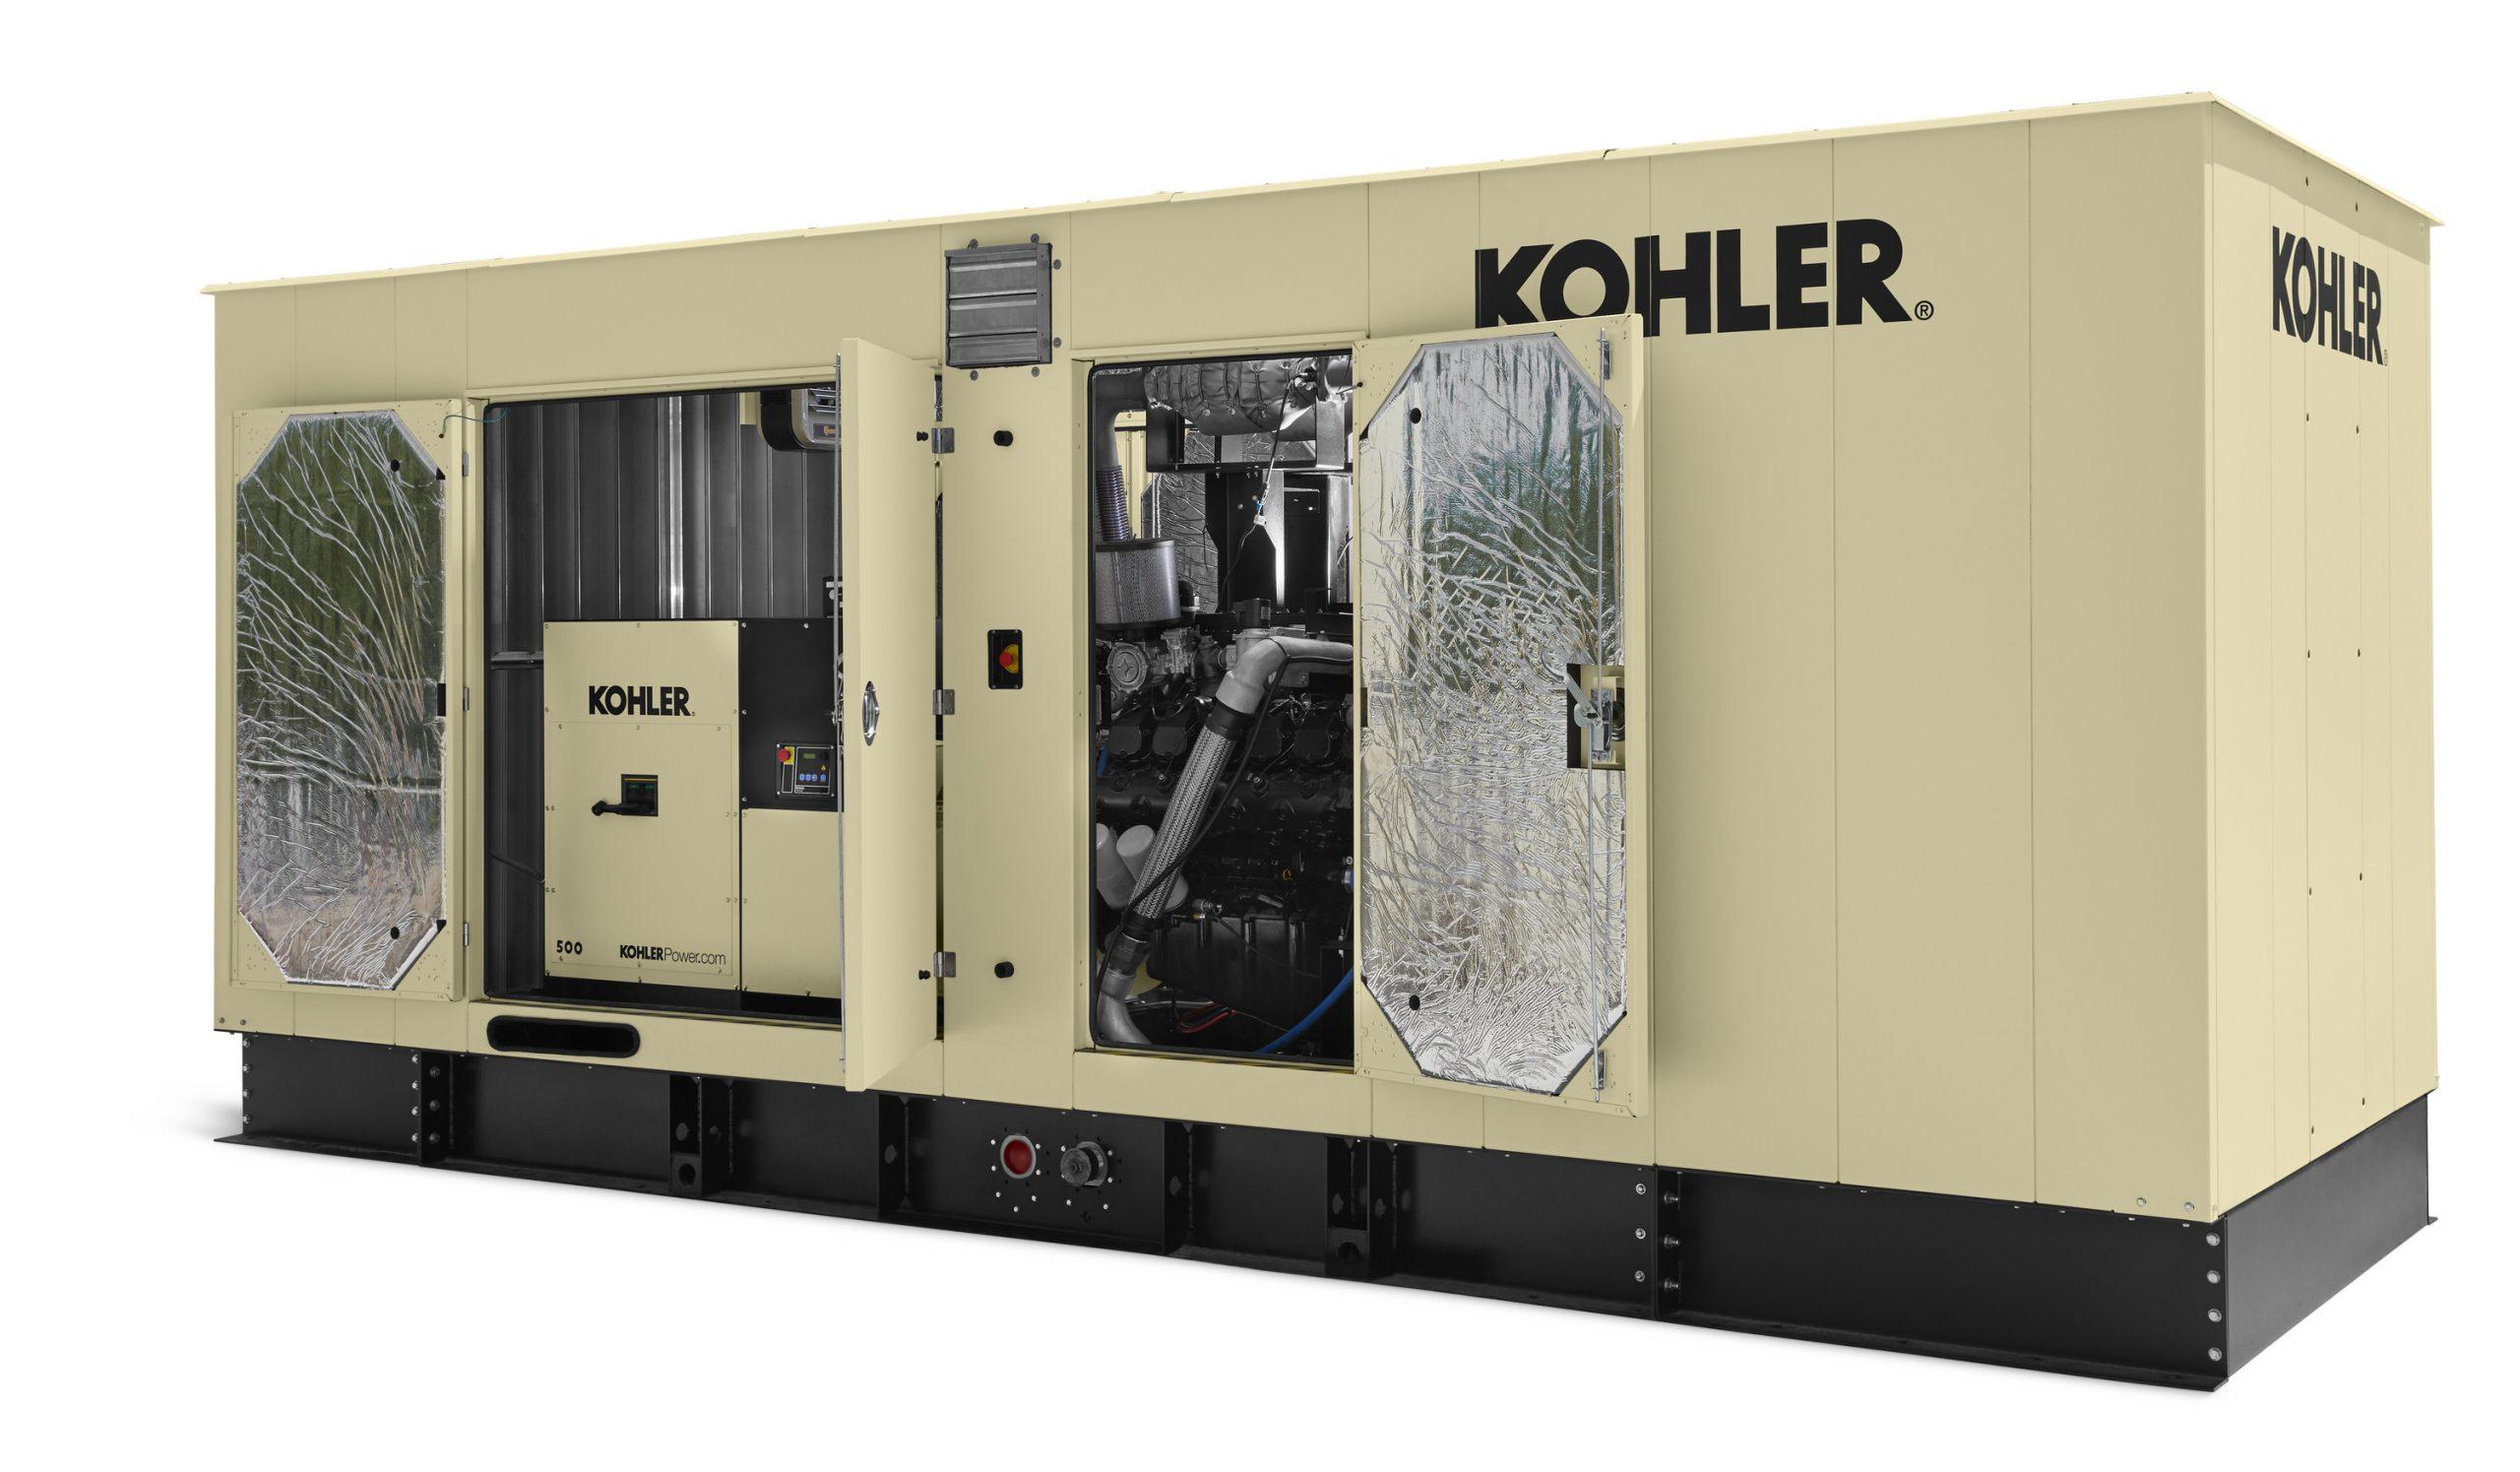 KOHLER Launches 300-500 kW Gas-Powered Generators